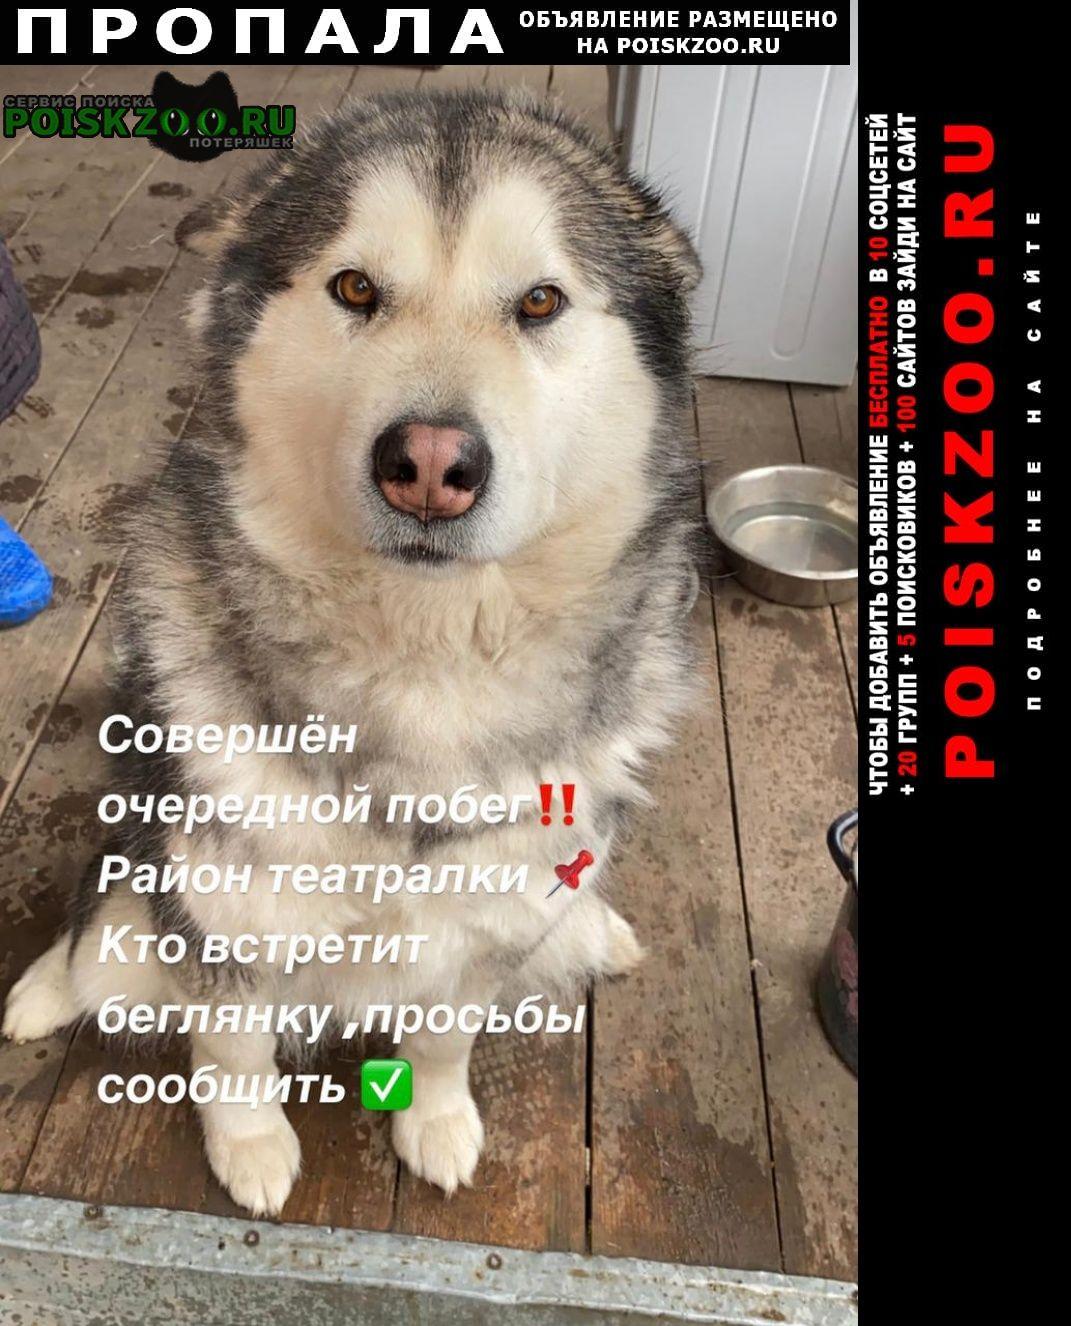 Пропала собака помогите найти собаку Ростов-на-Дону